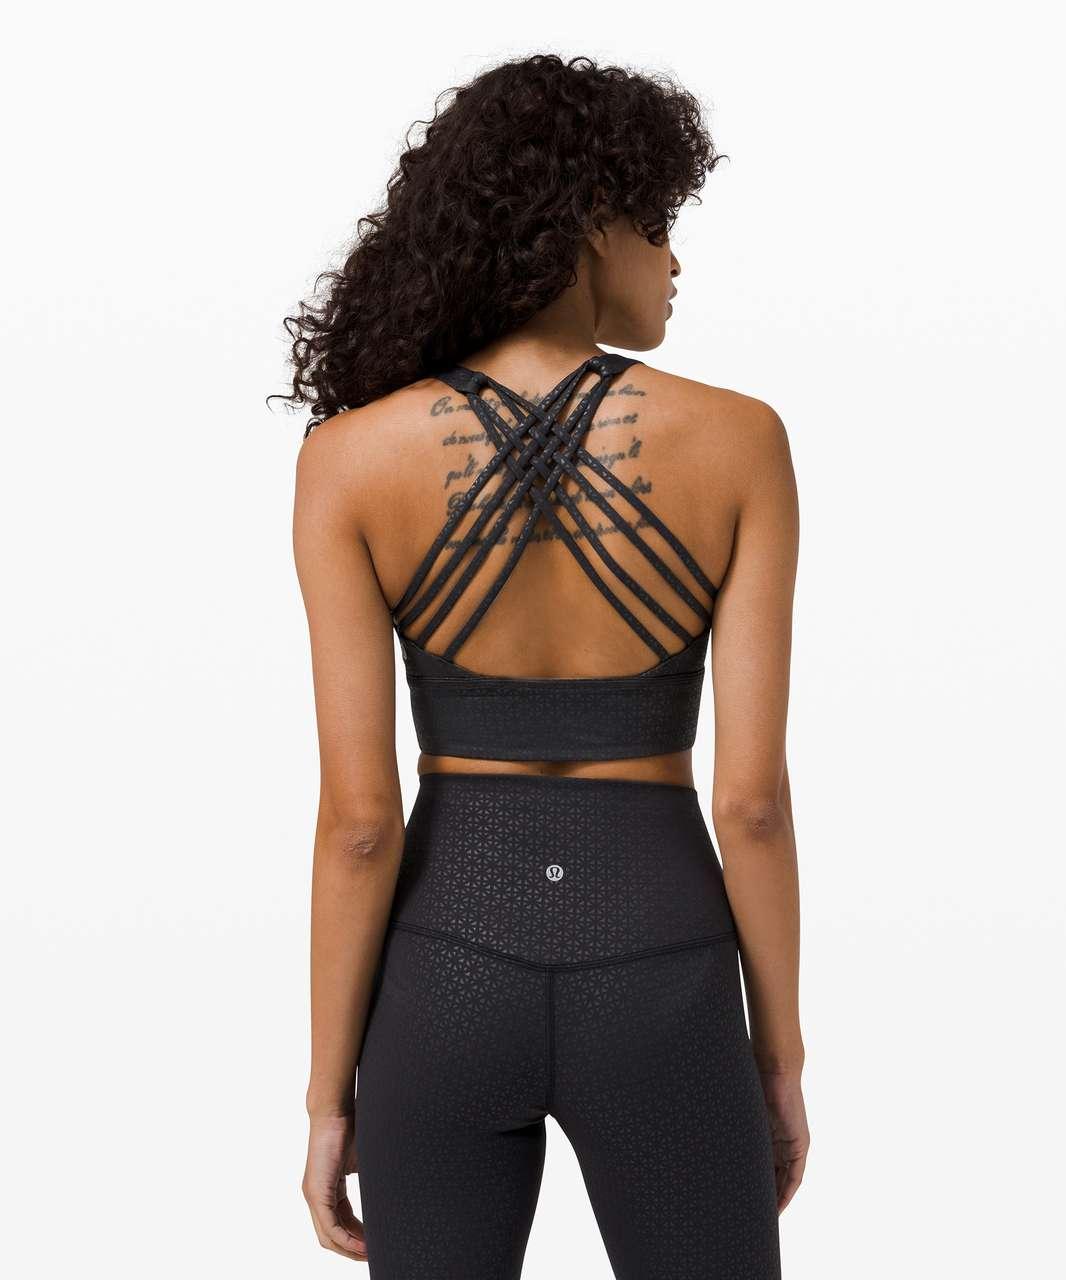 Lululemon Free to Be Bra Wild Long Line *Light Support, A/B Cup - Lattice Work Emboss Black